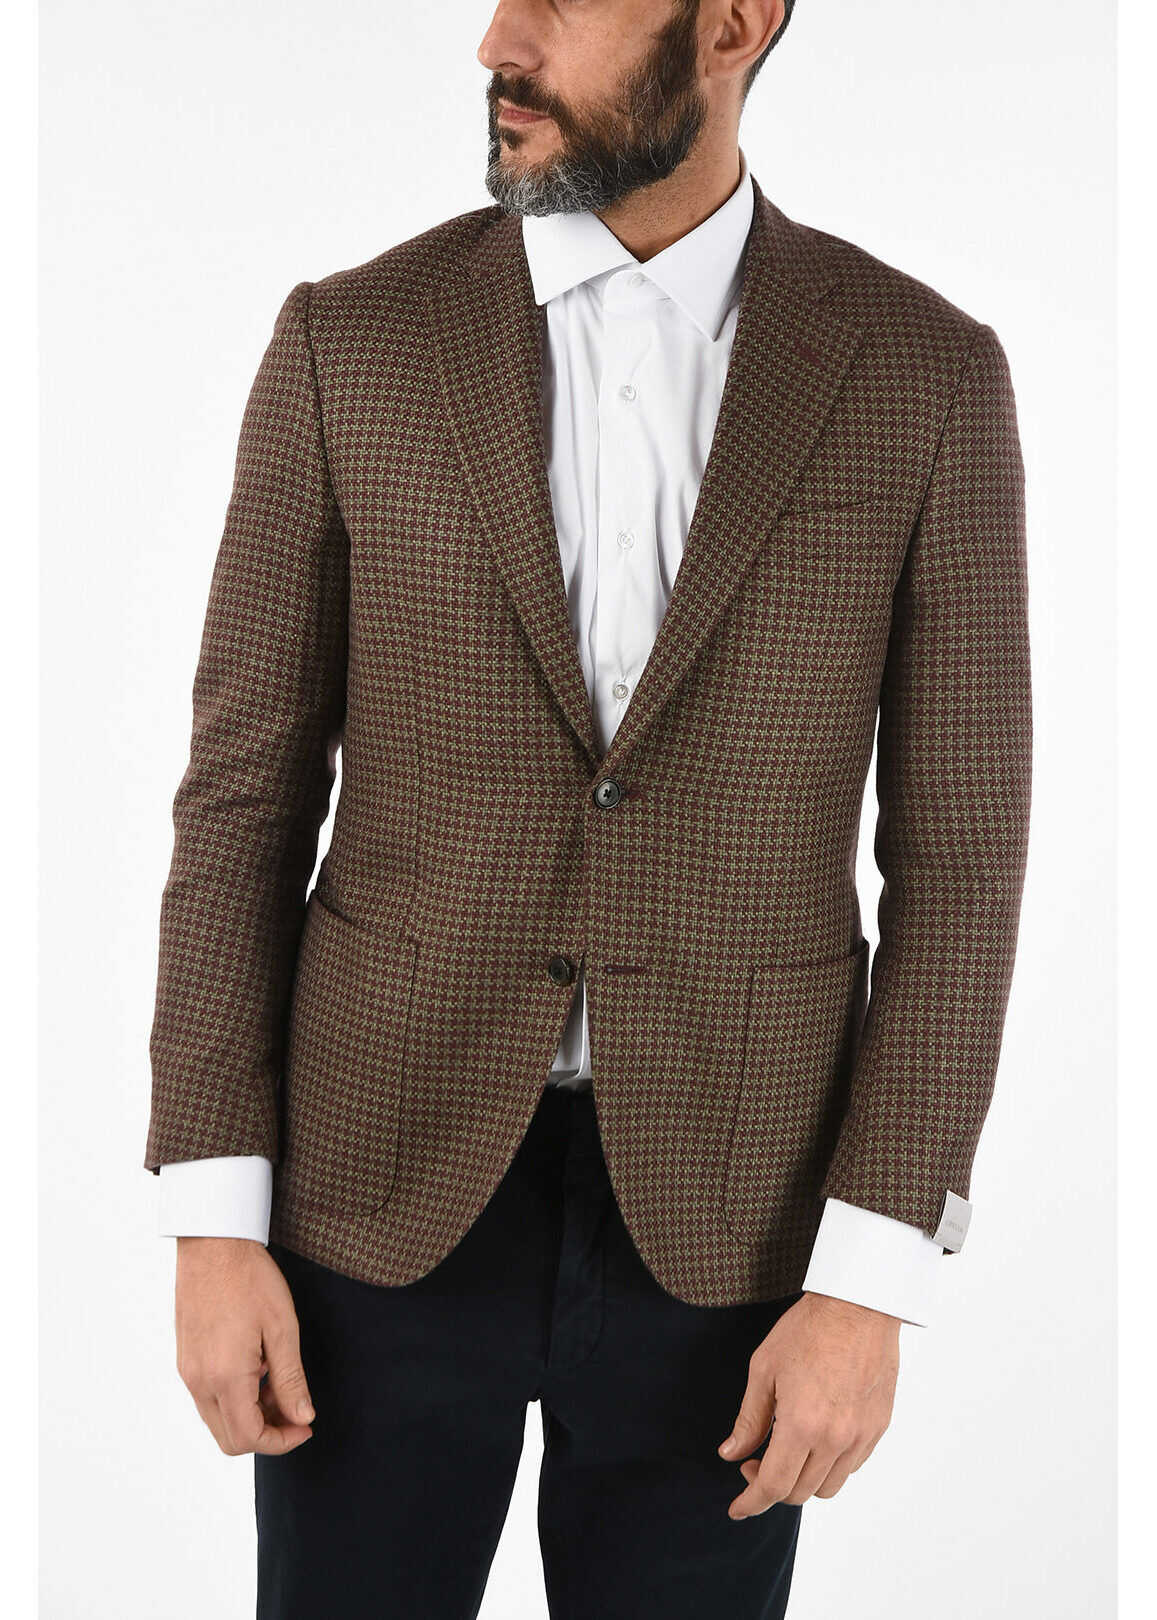 CORNELIANI houndstooth silk and cashmere LEADER SOFT drop 7R blazer MULTICOLOR imagine